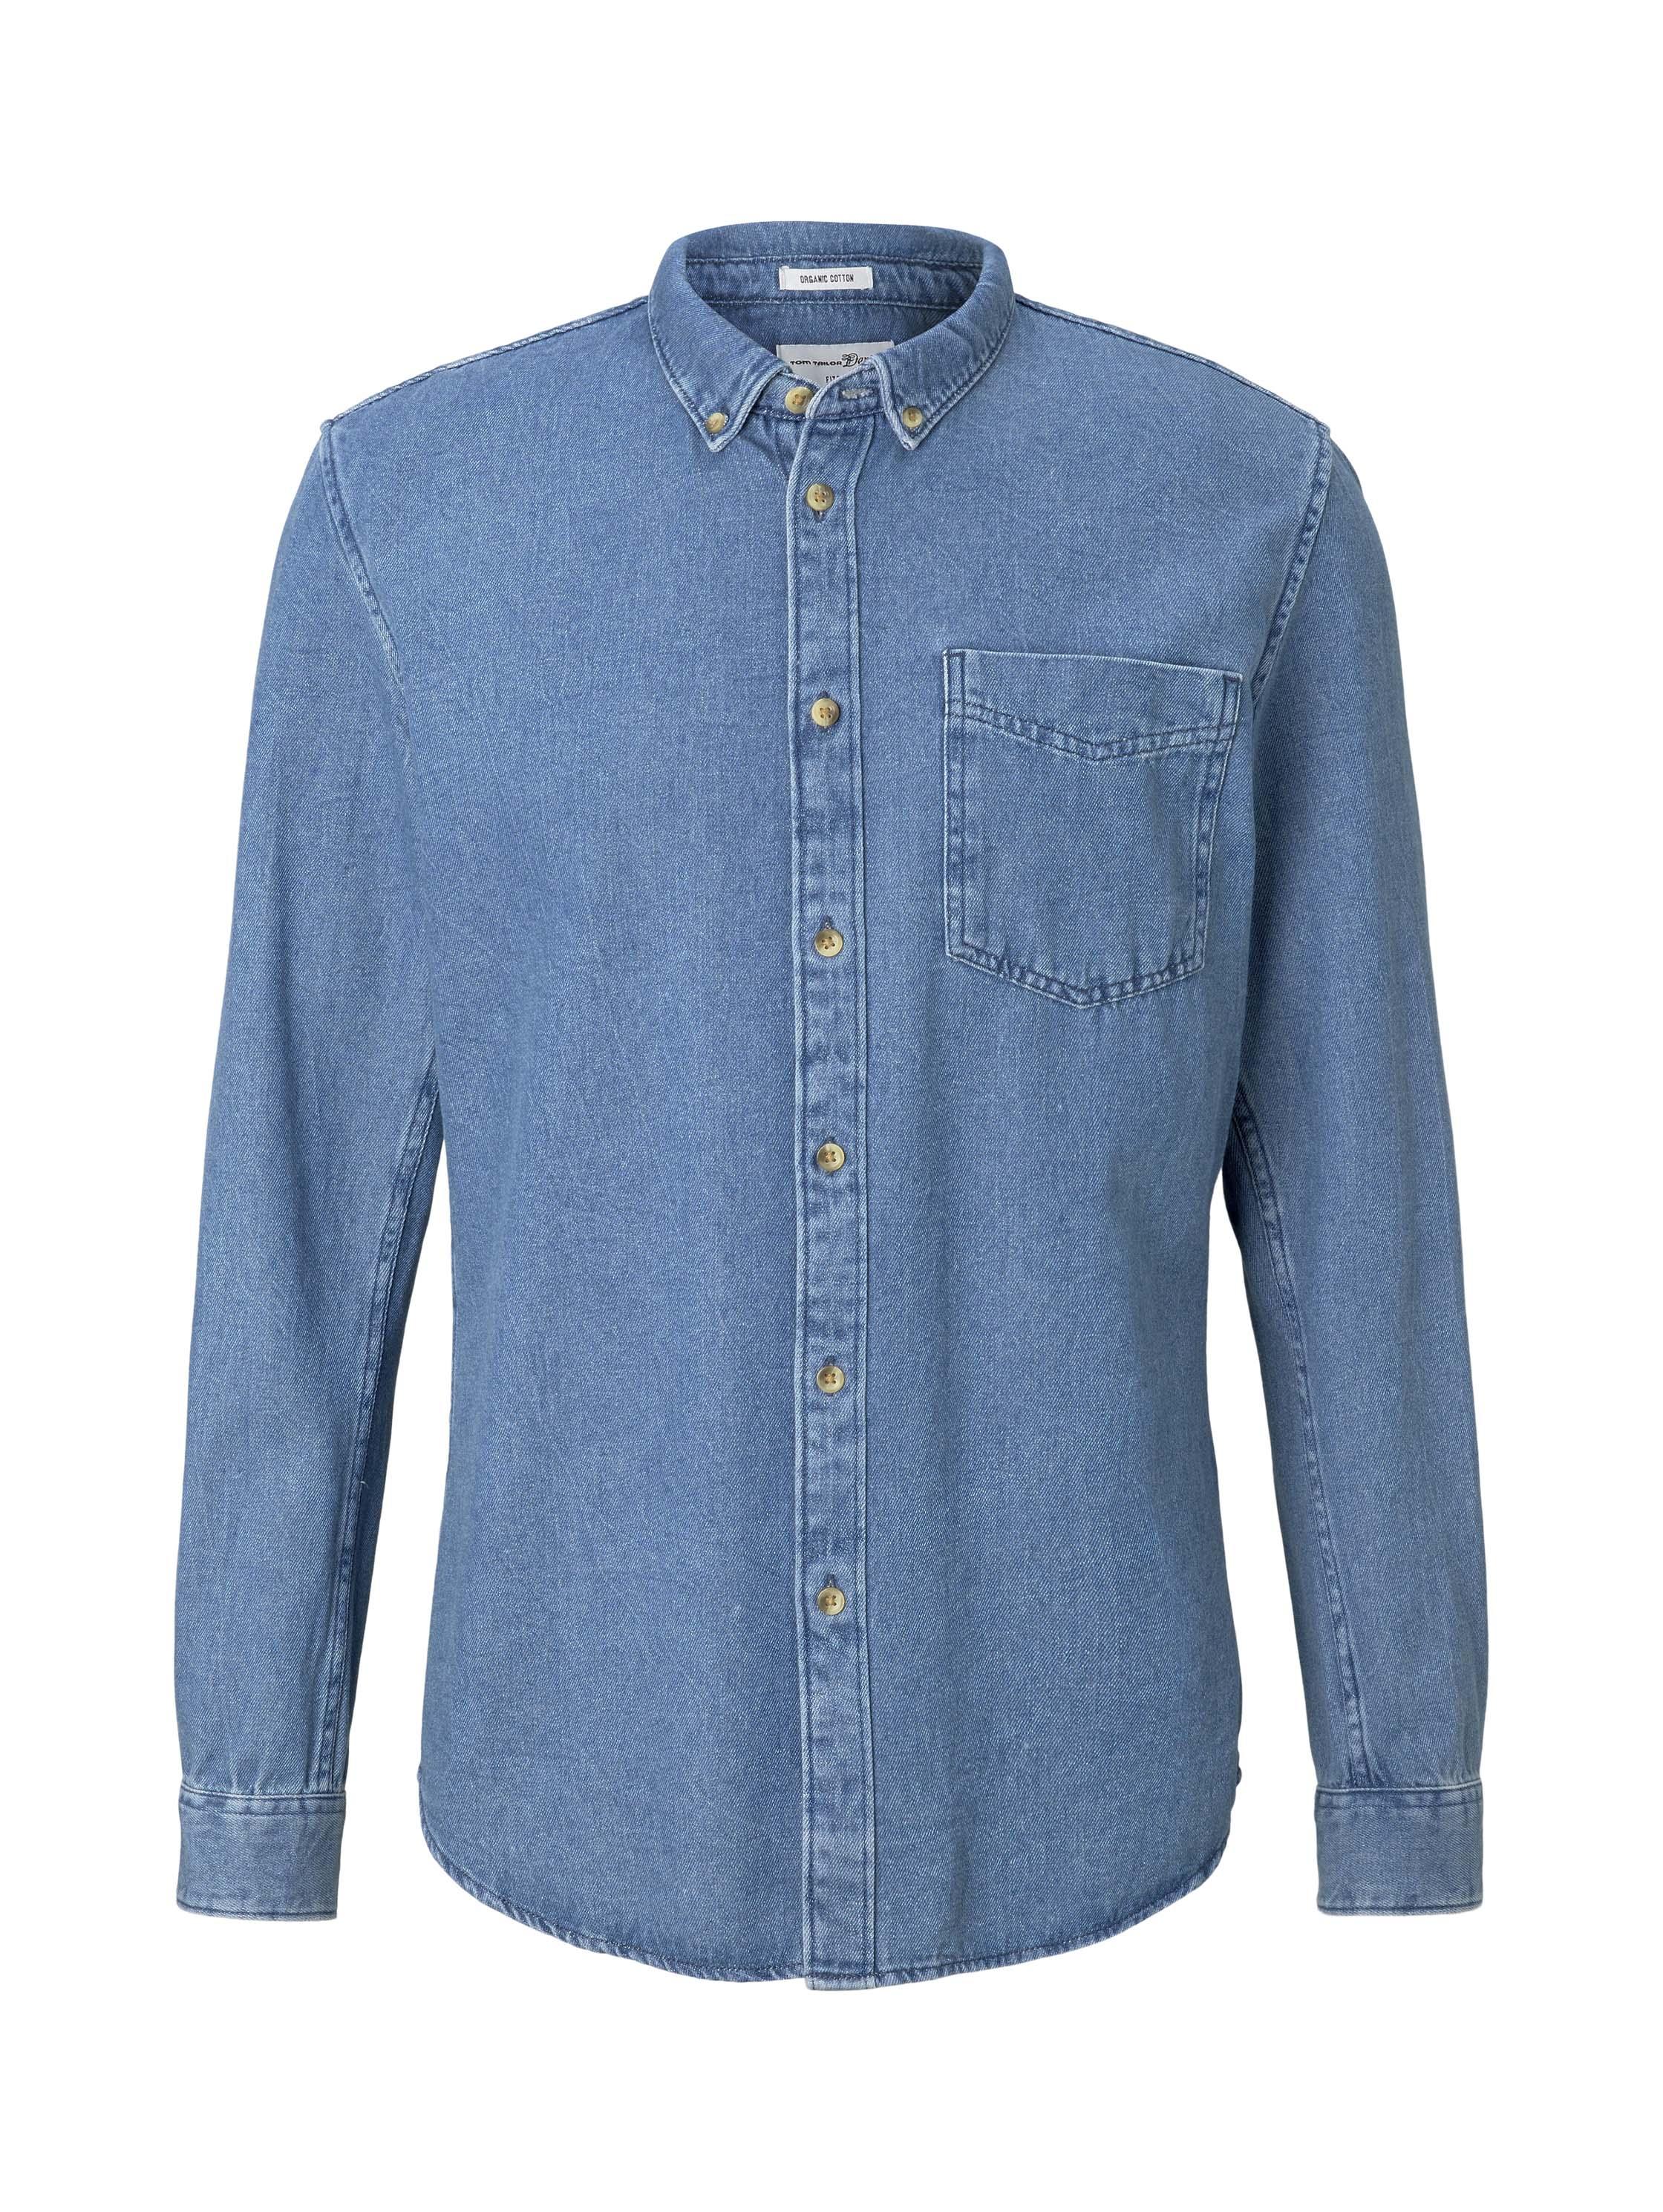 button down denim shirt, Blue Denim